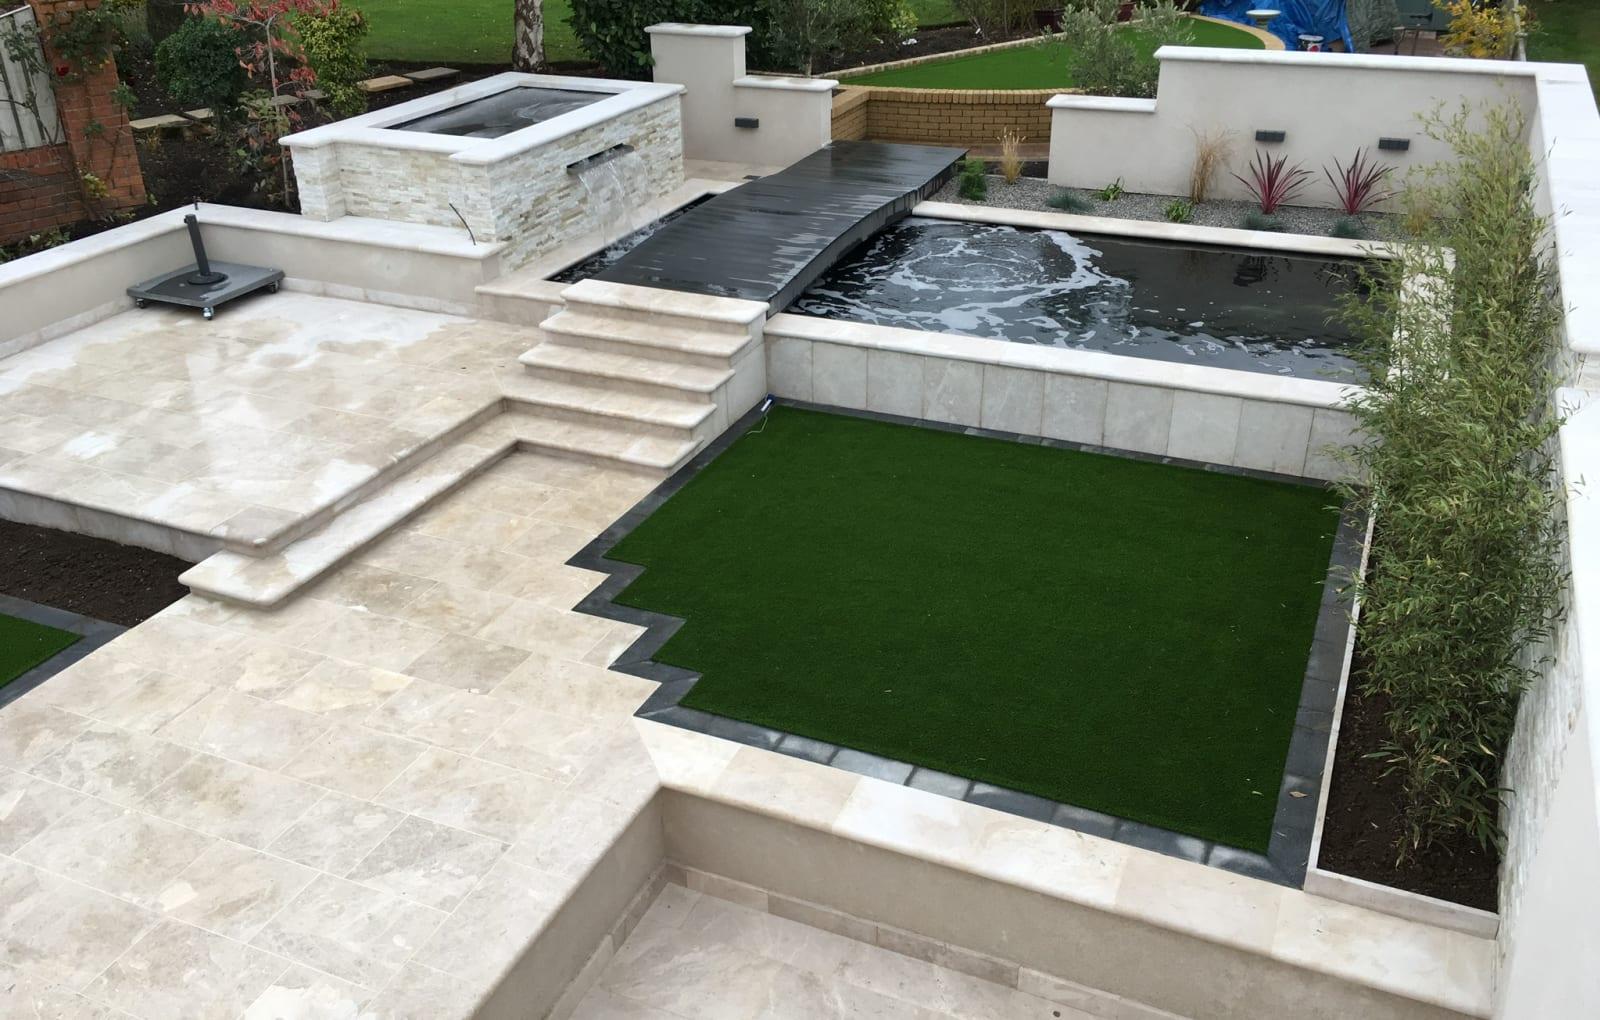 multi level patio featuring a koi pond